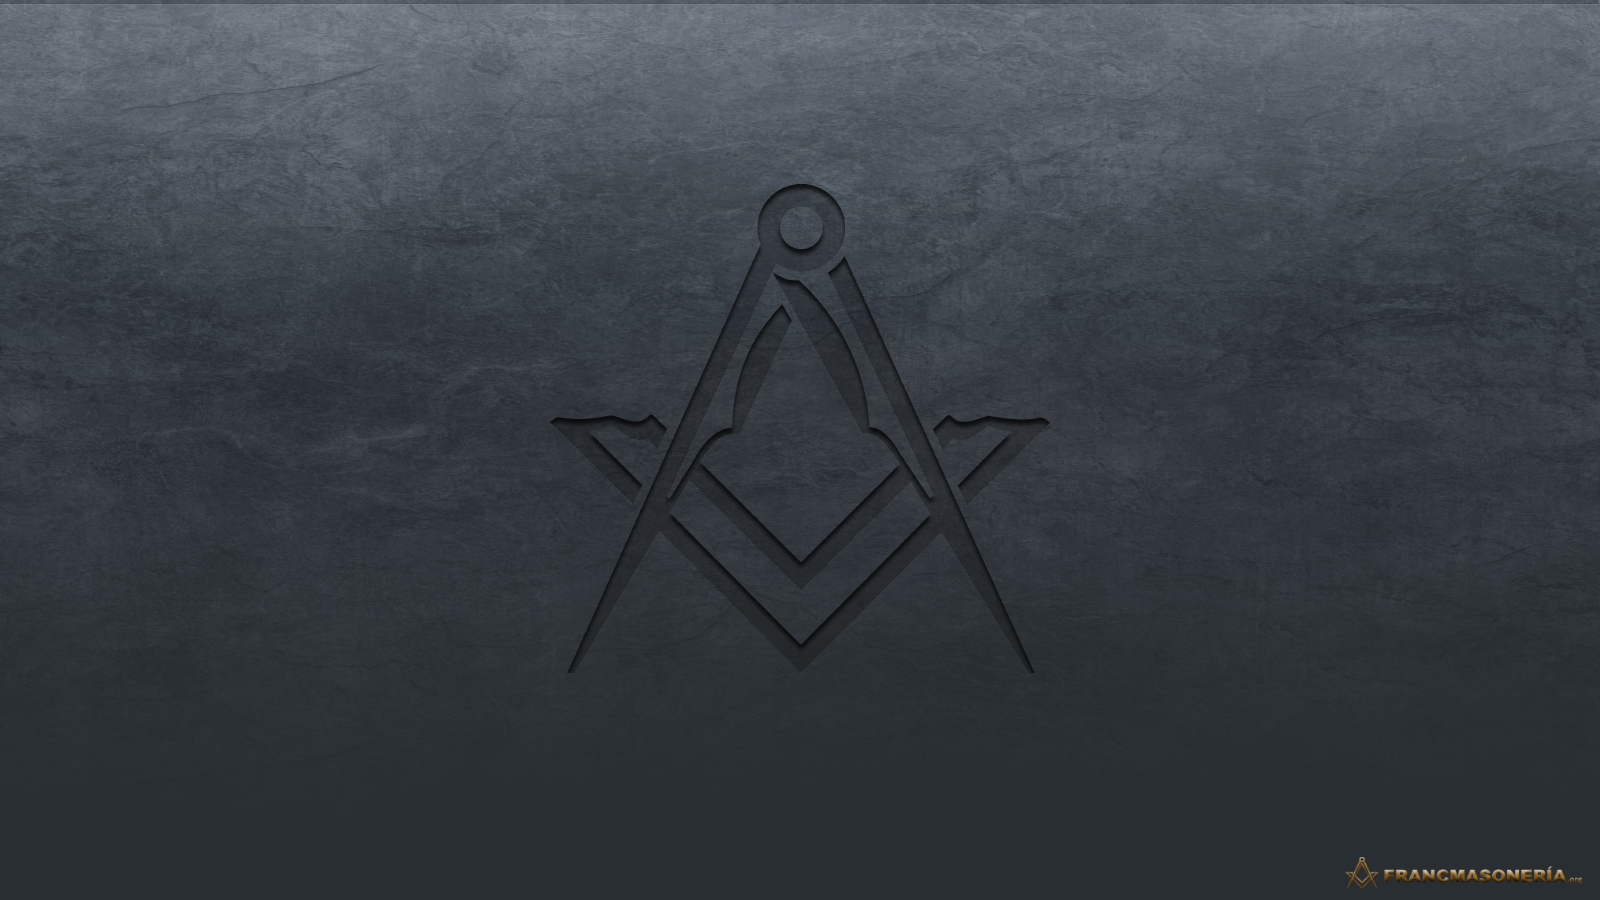 Dating a freemason